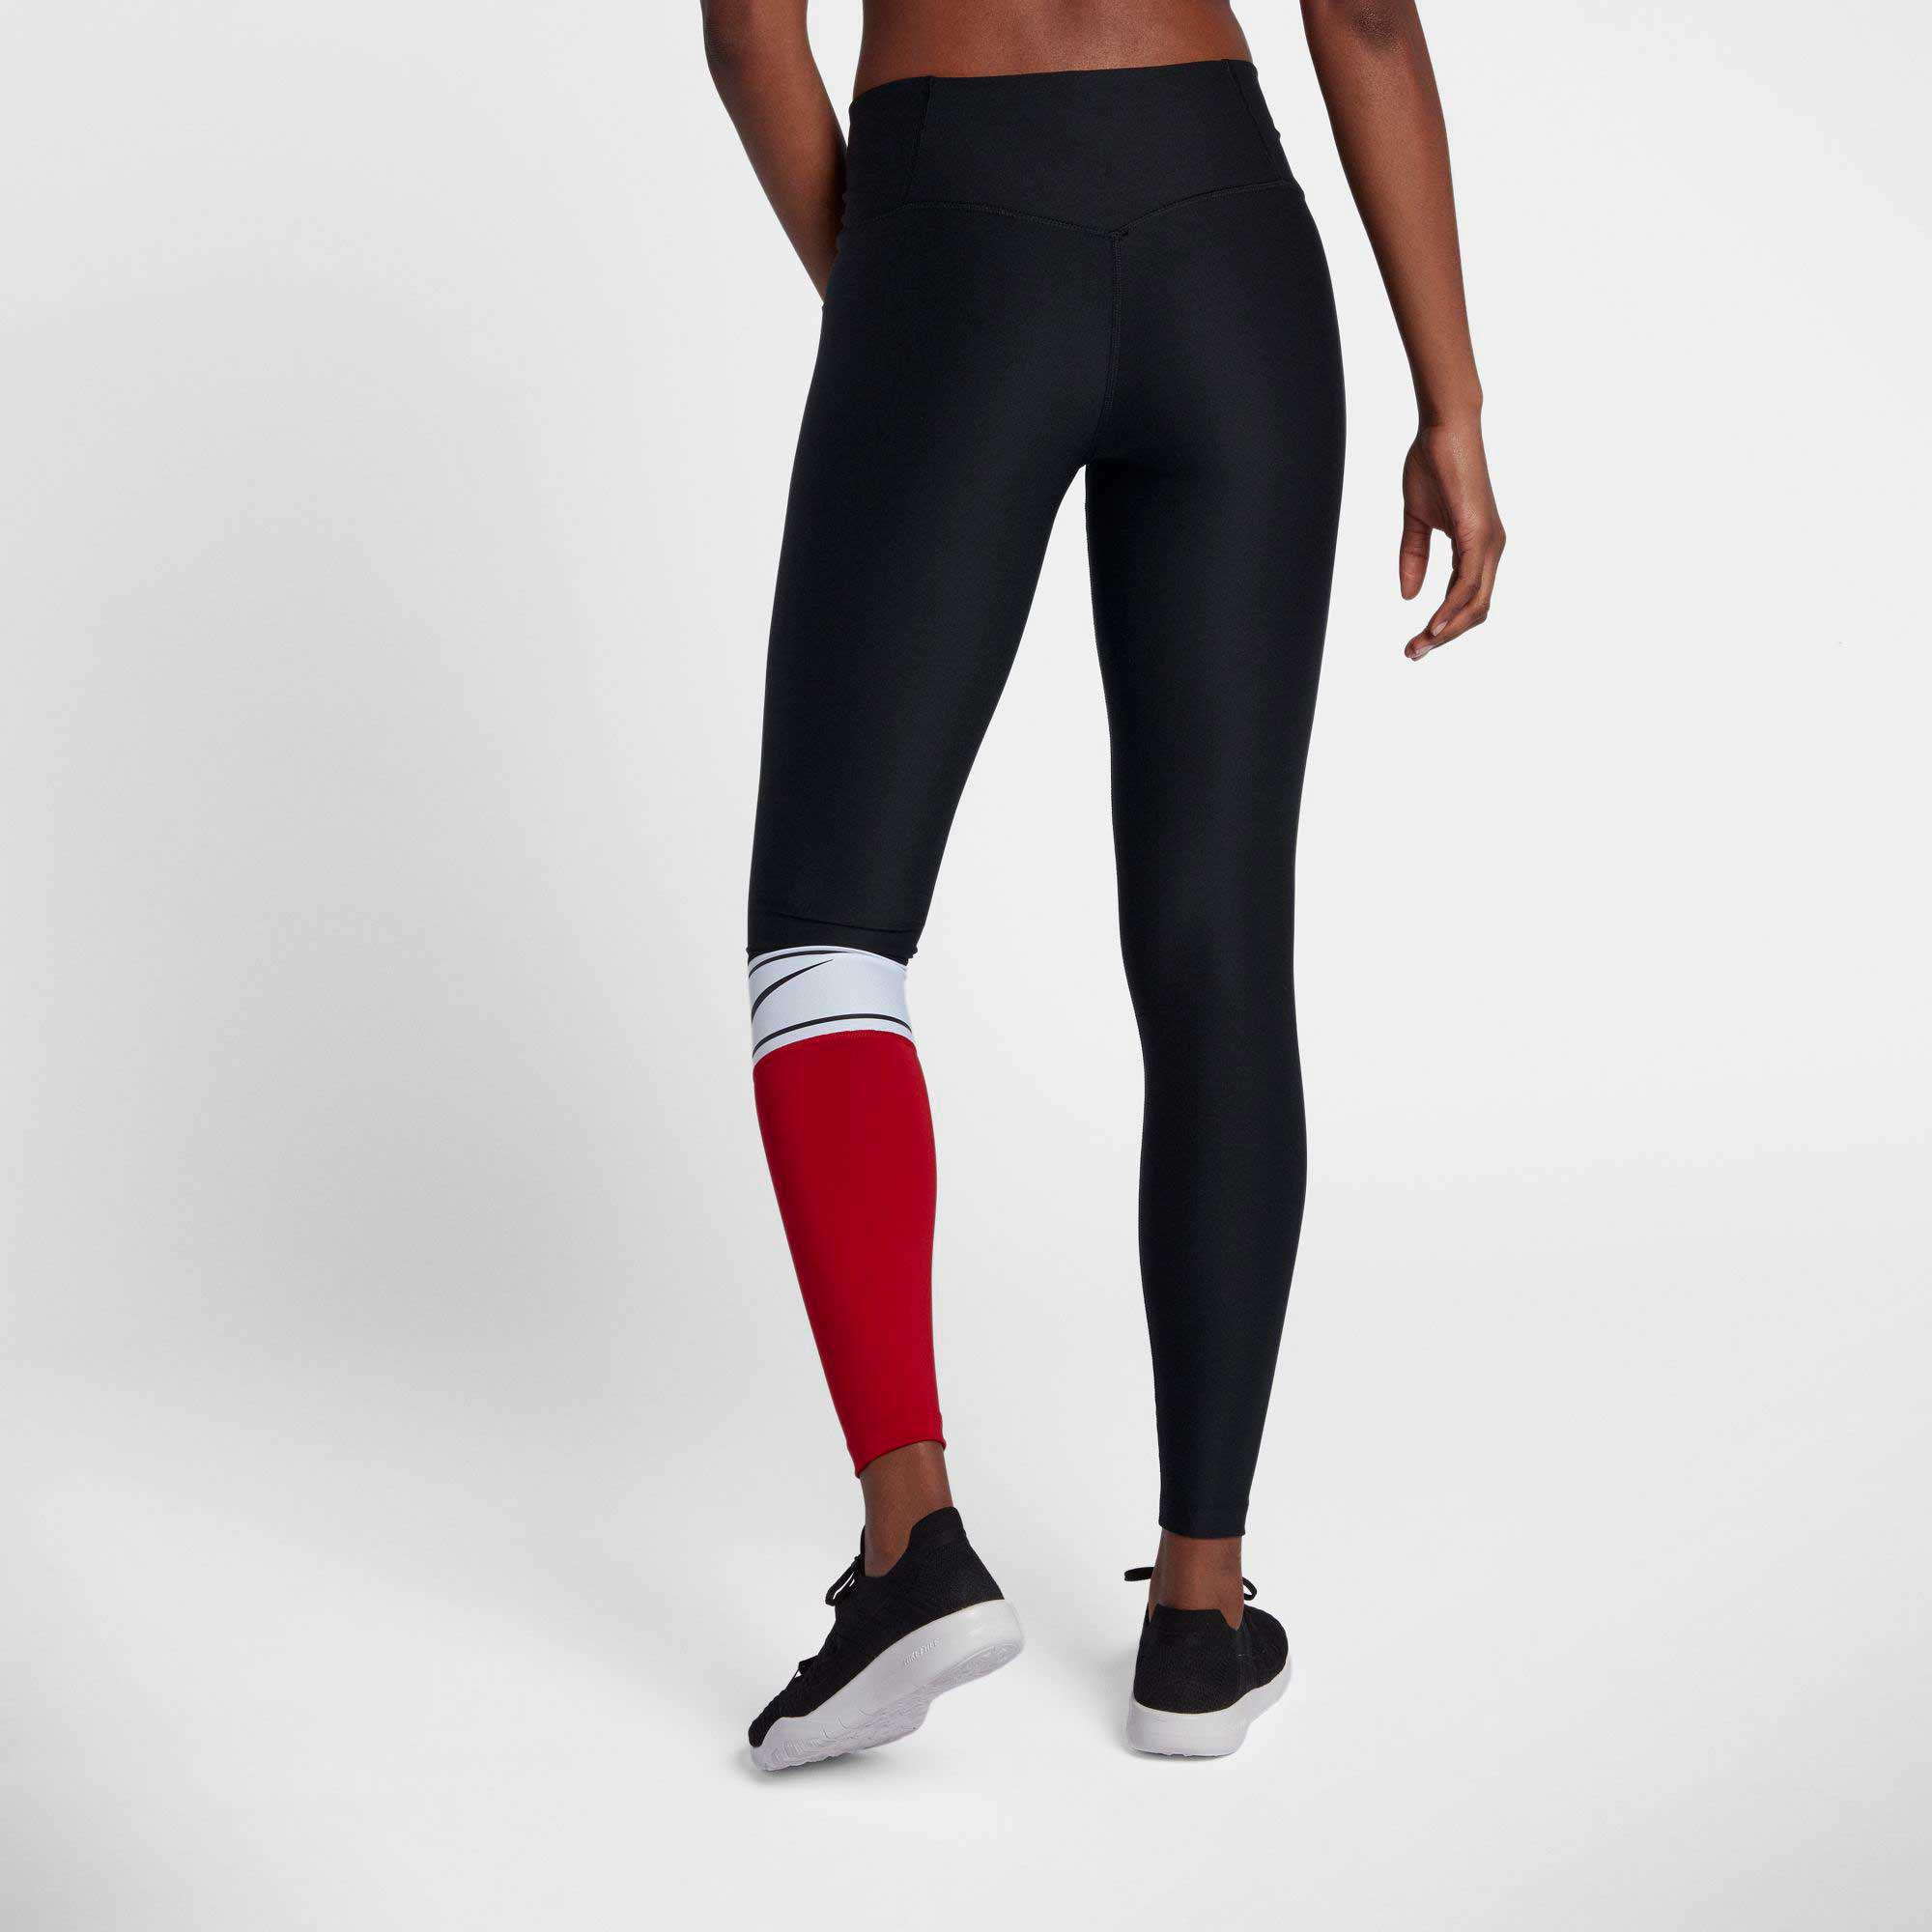 8f3f1b6f58be01 Nike Power Colorblock Training Tights in Black - Lyst